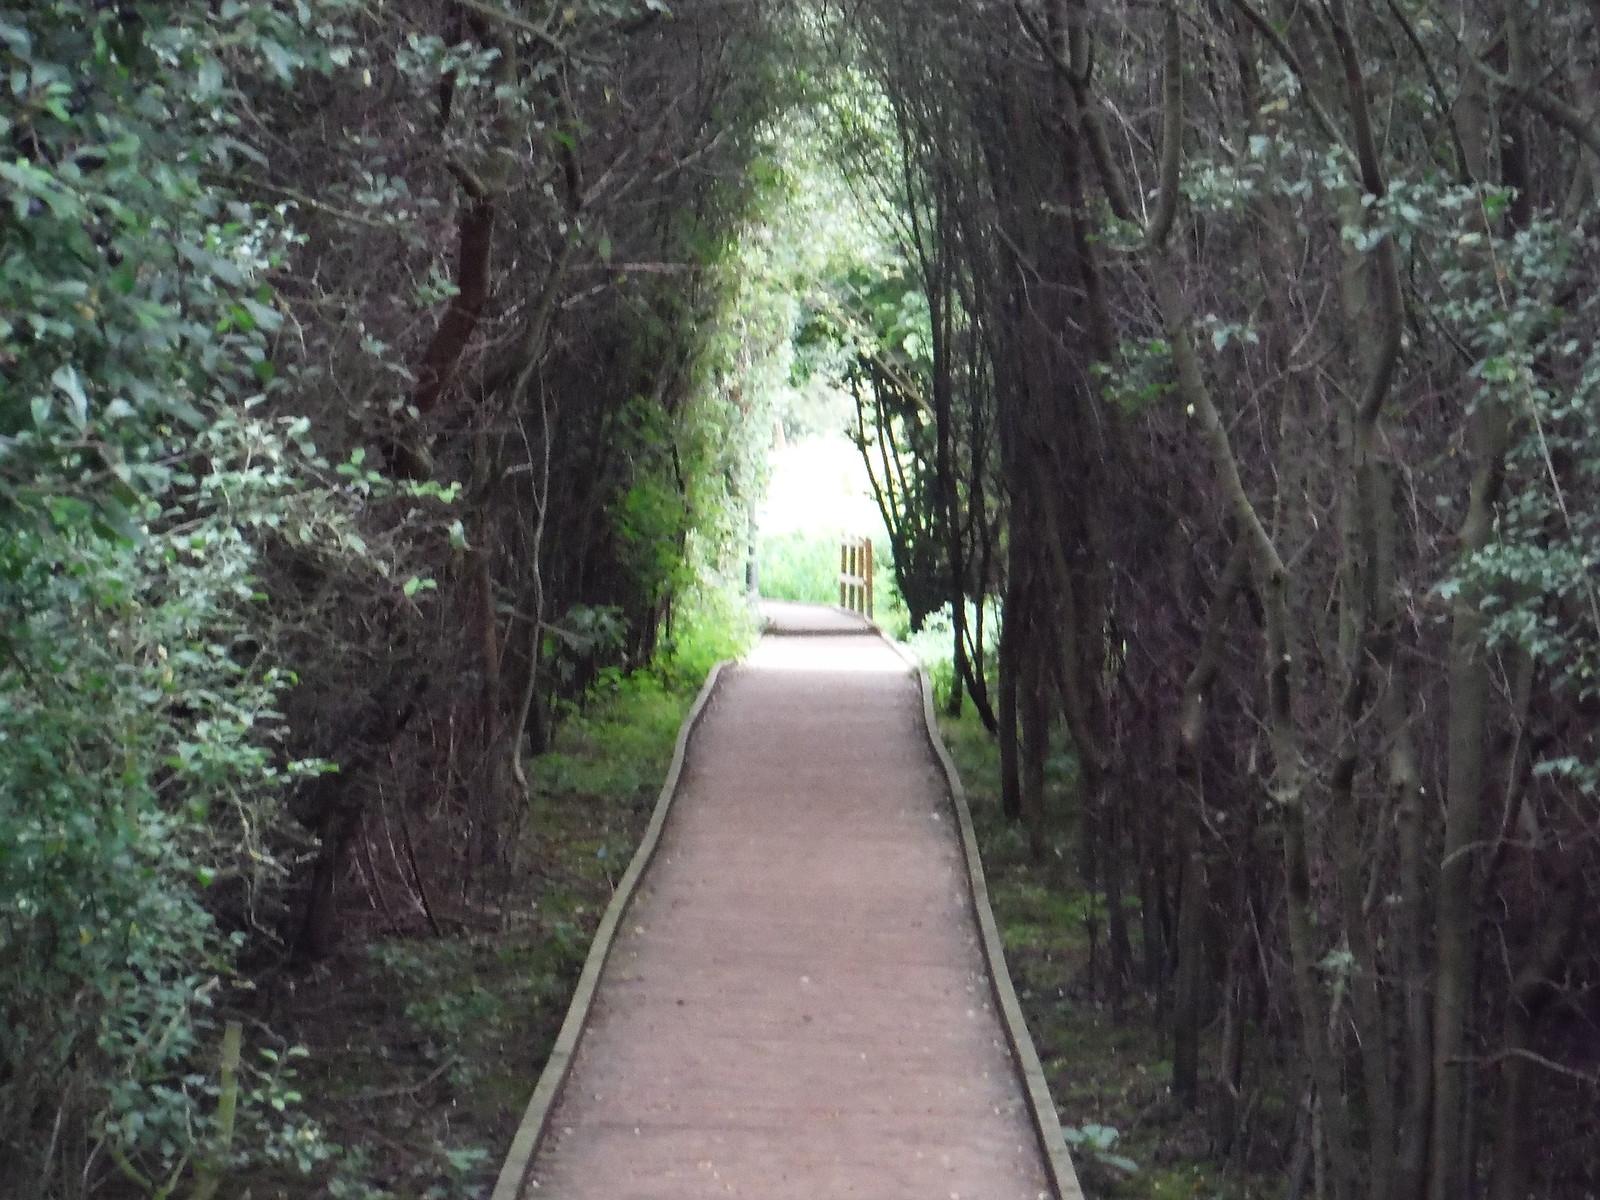 From Pishiobury Park to the Stort Navigation SWC Walk 164 Roydon to Sawbridgeworth via Henry Moore Foundation